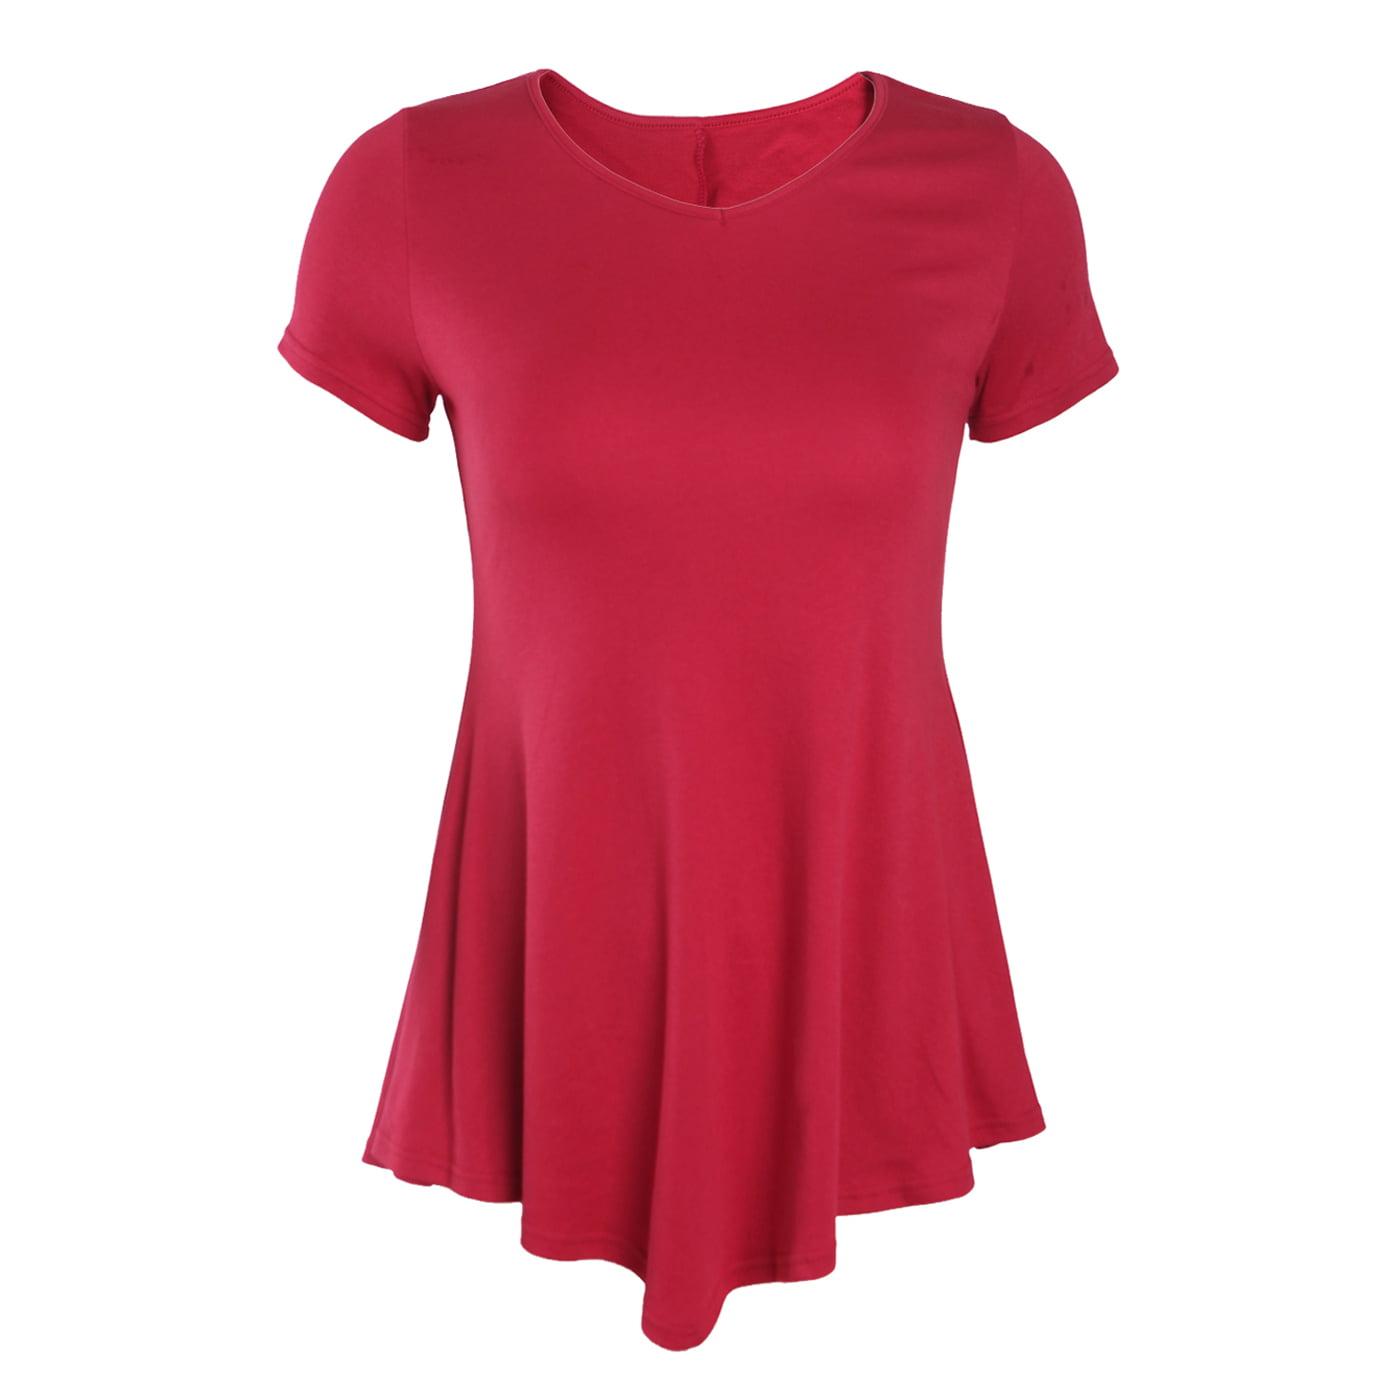 Hde Womens Short Sleeve Flowy Handkerchief Hem Tunic Top Flare